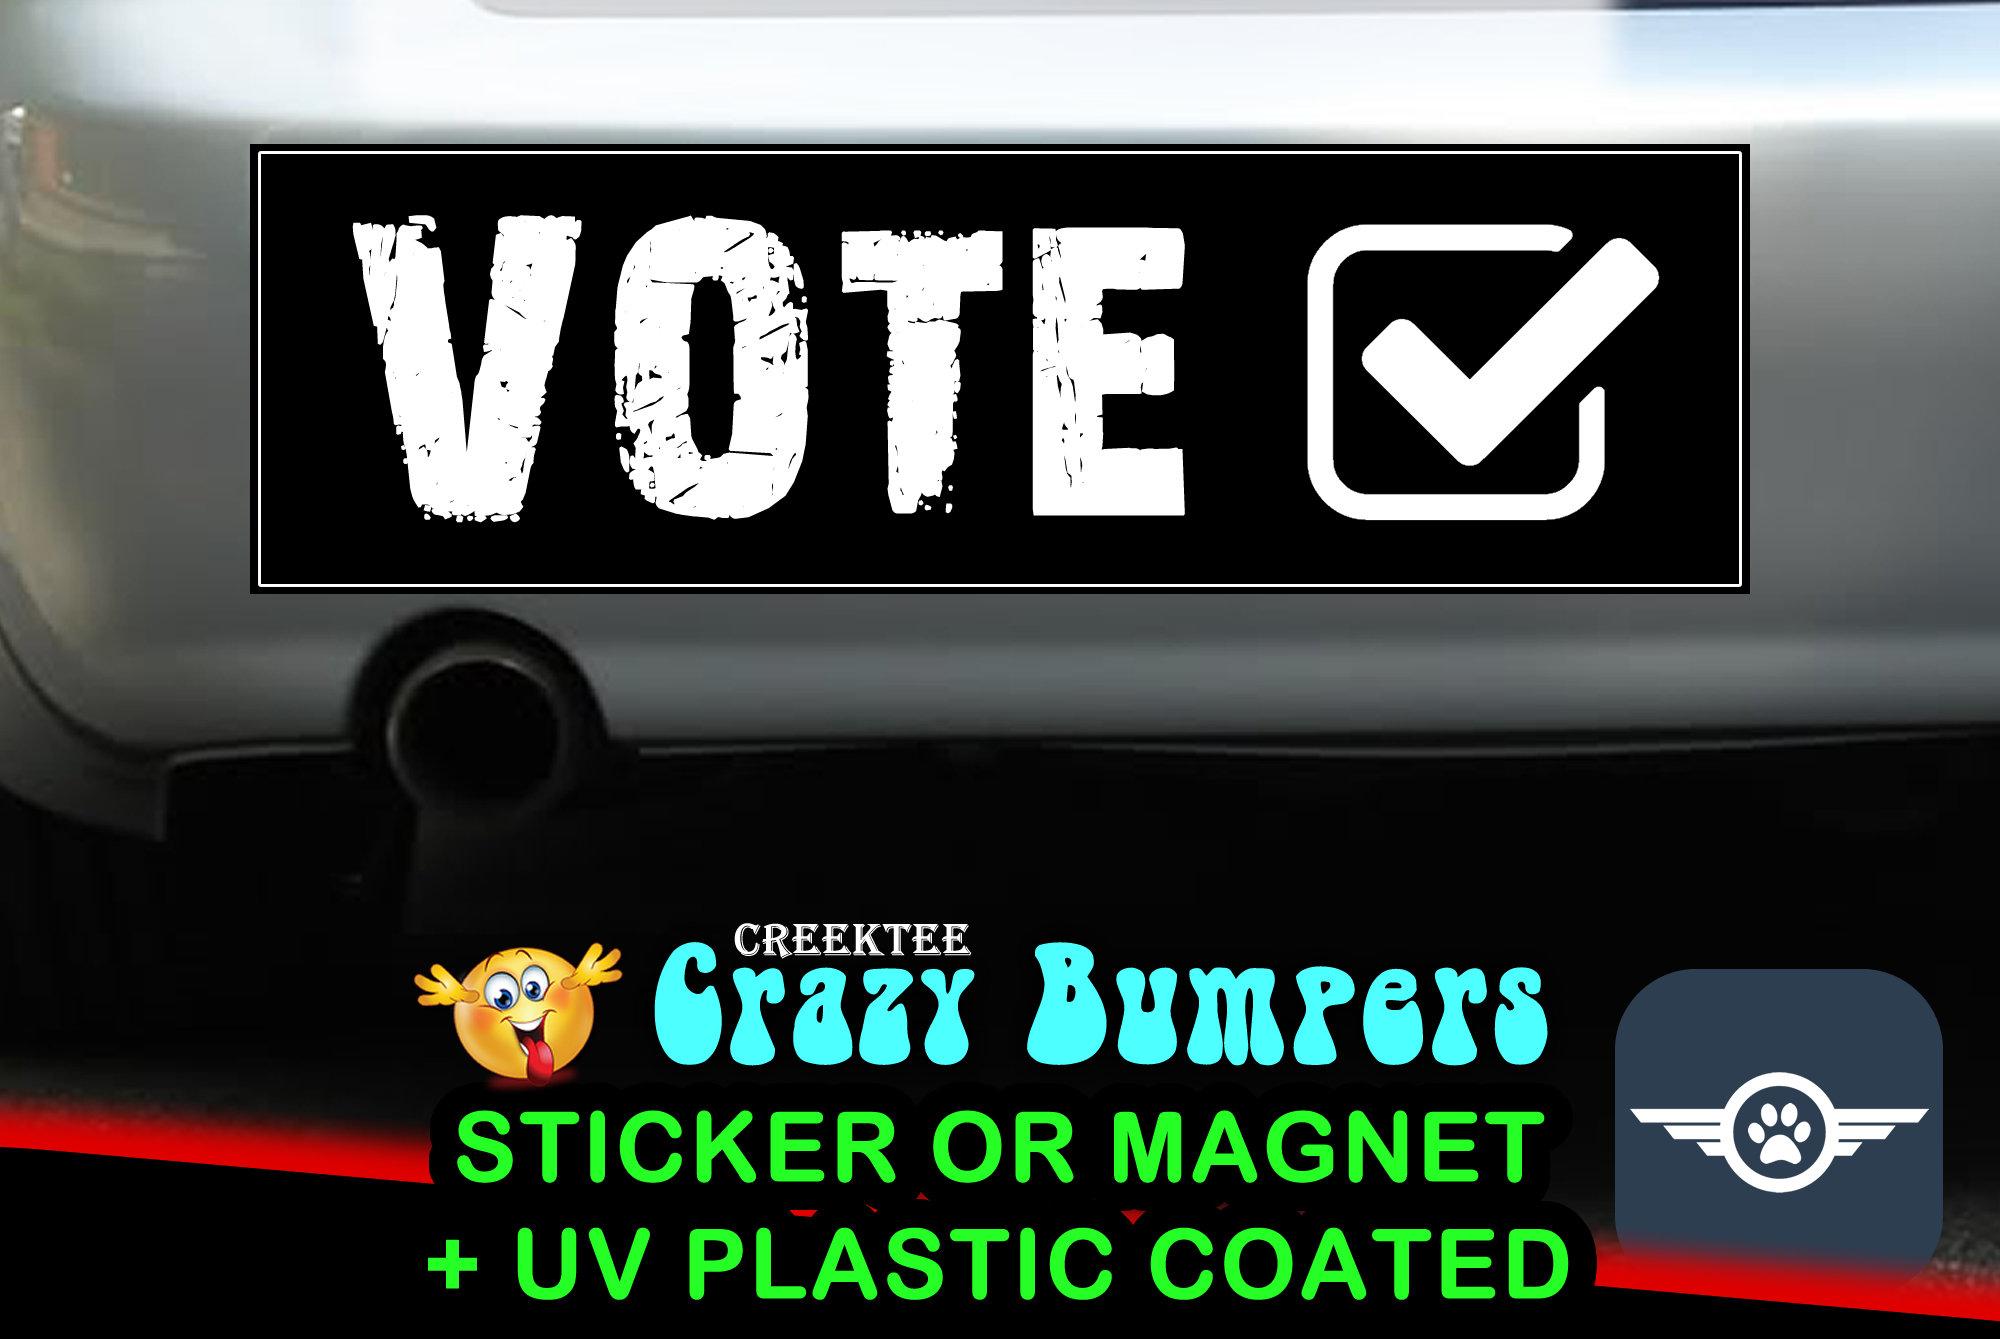 CAD$9.74 - Vote 10 x 3 Bumper Sticker or Magnetic Bumper Sticker Available